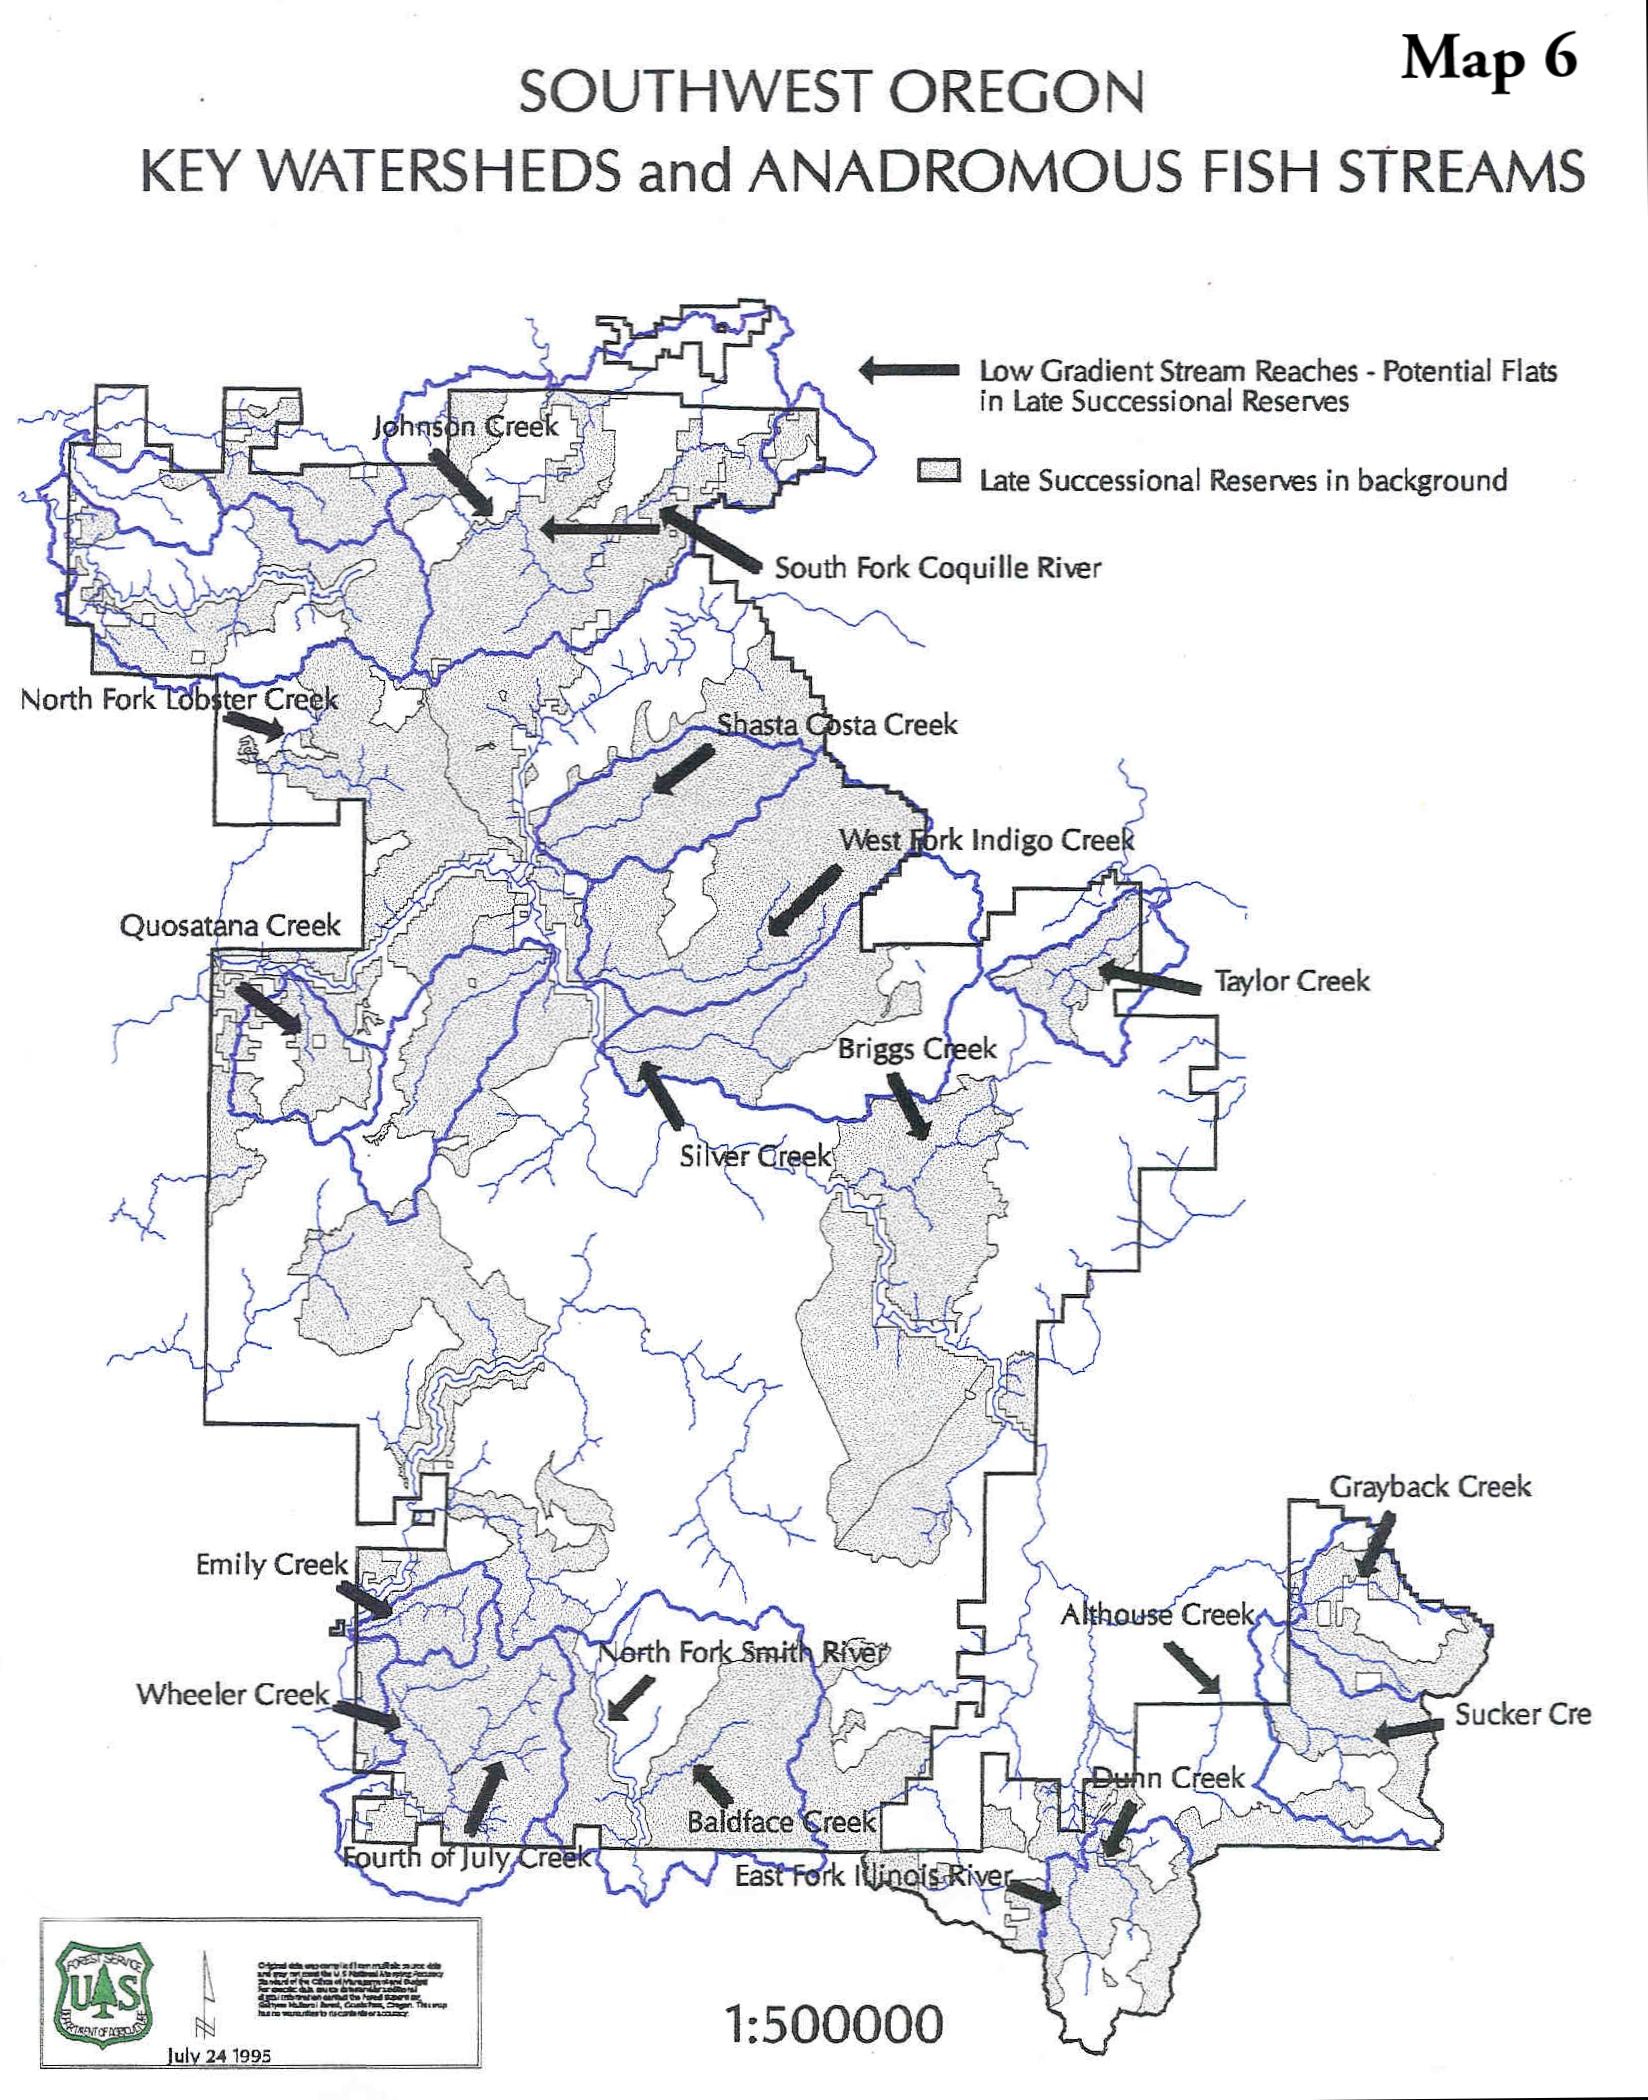 Southwest Oregon - Key Watersheds and Anadromous Fish Streams (1,427 KB JPG) ...